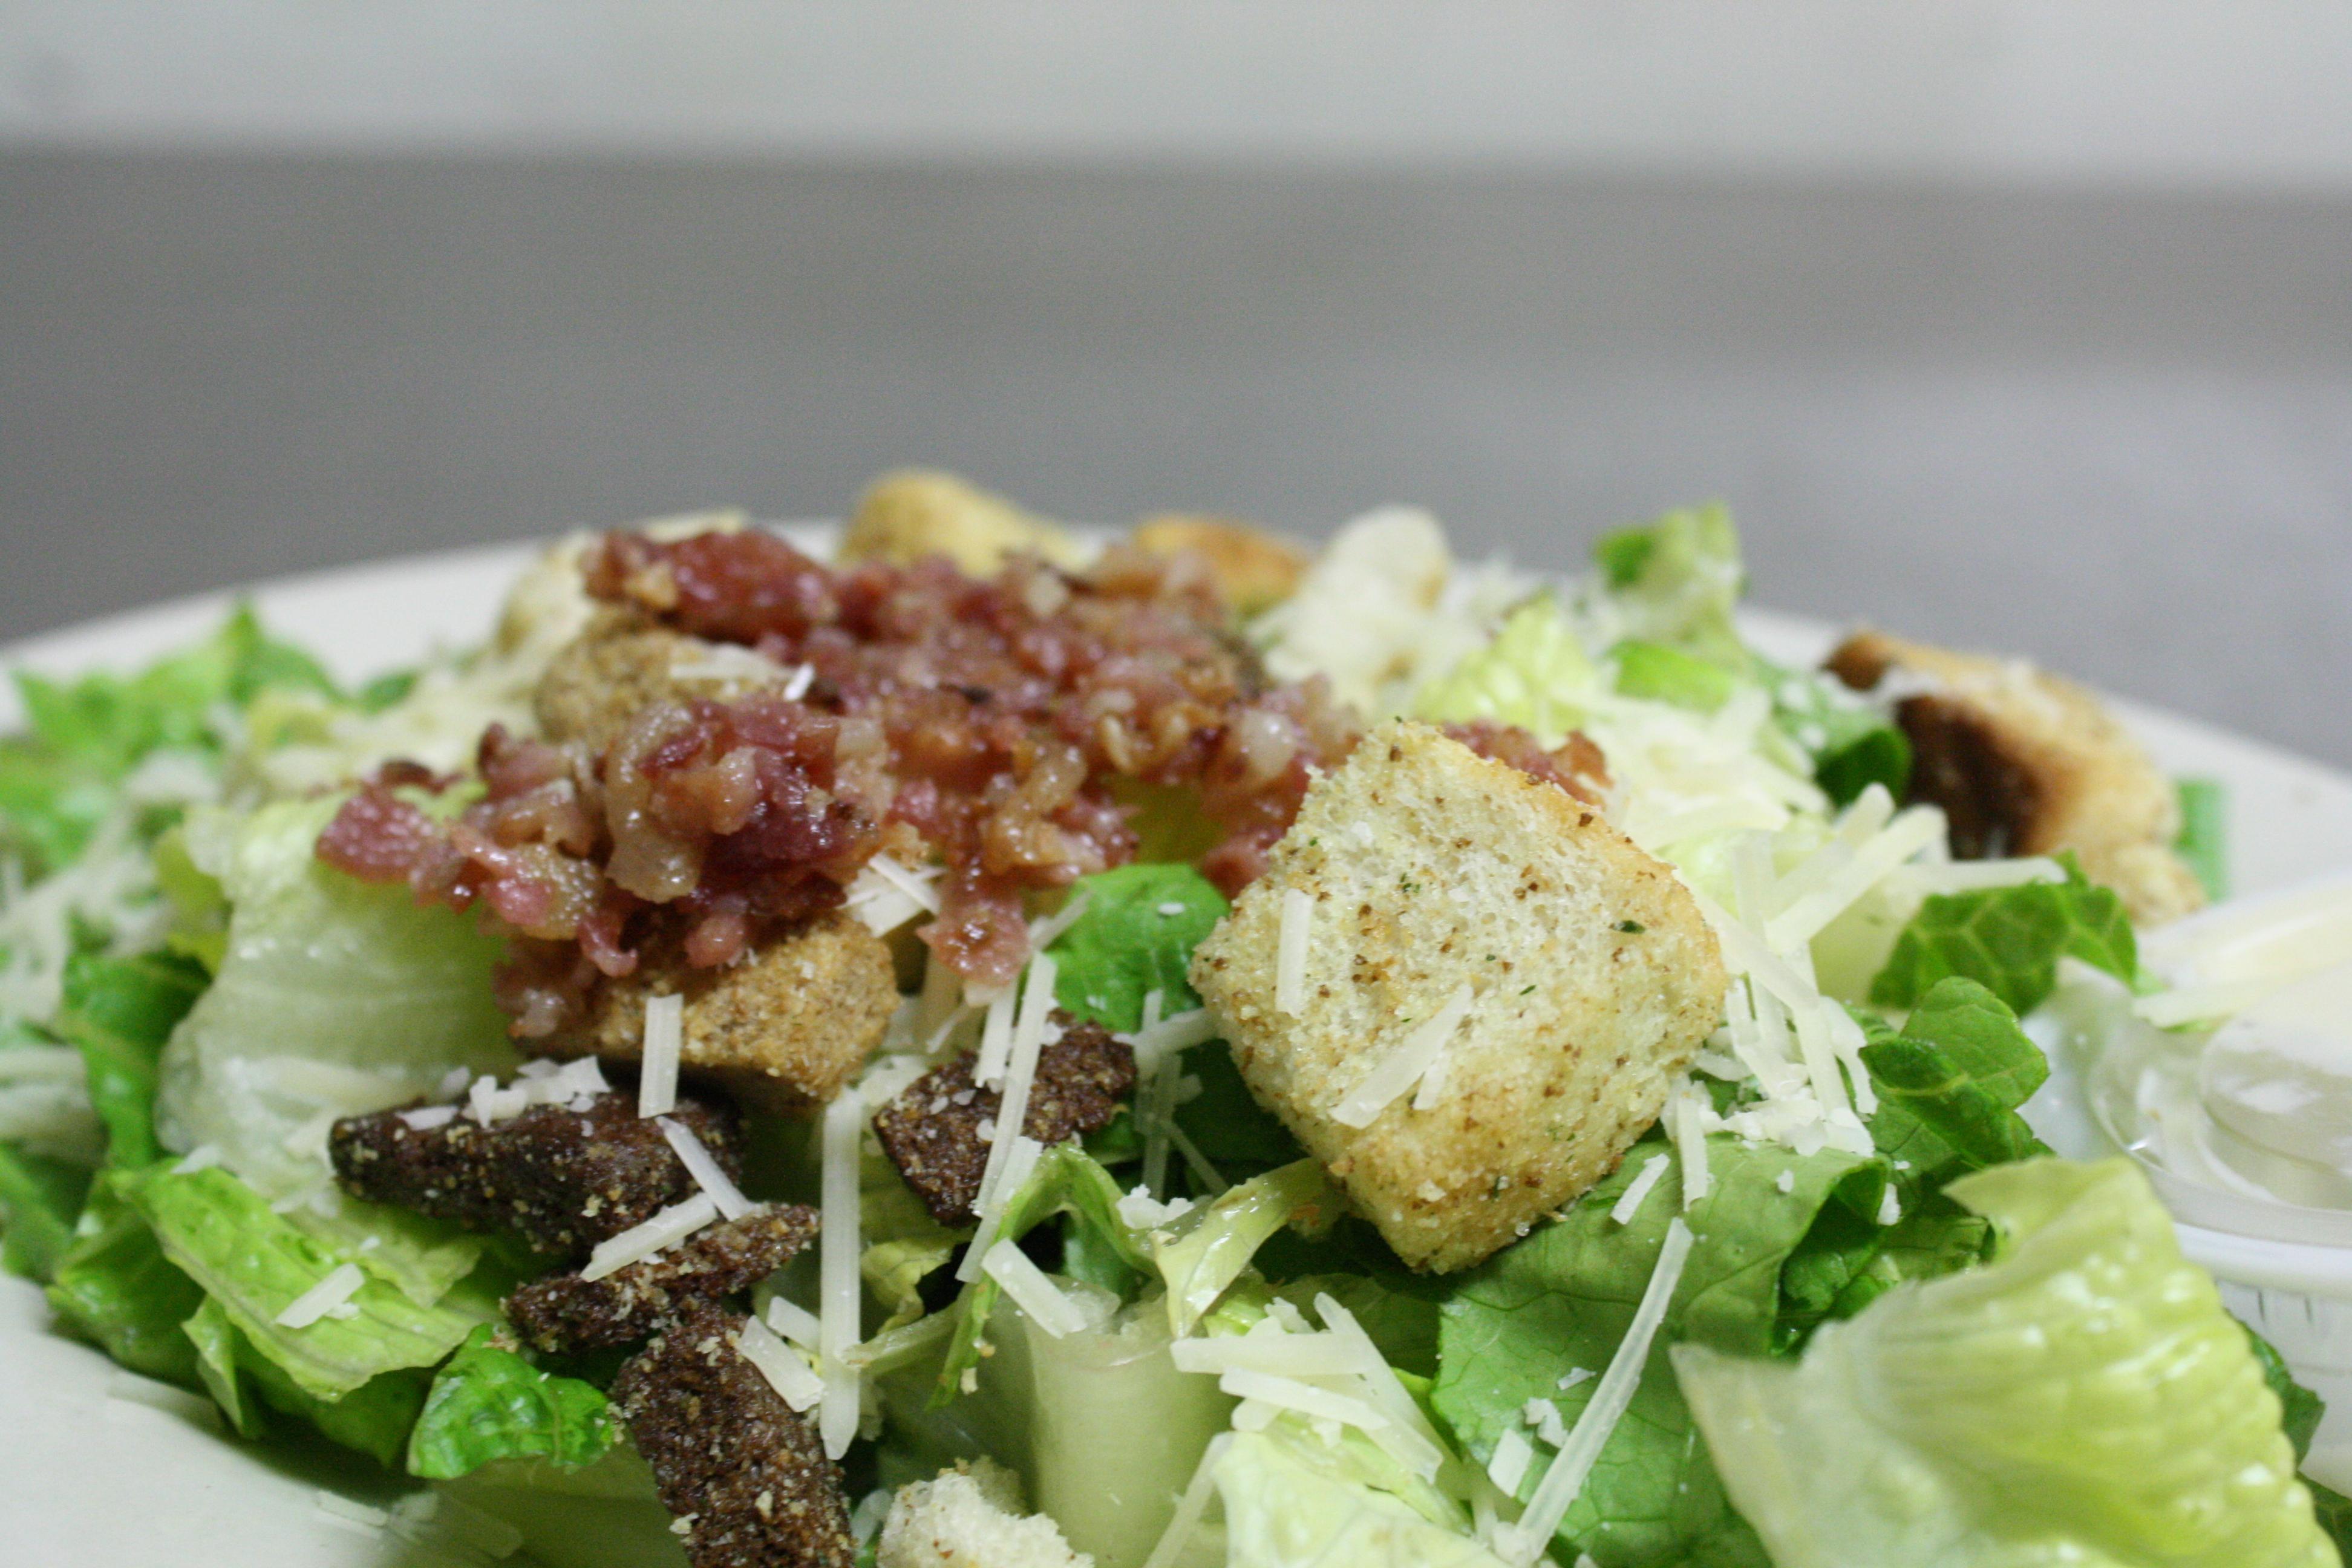 So Salads